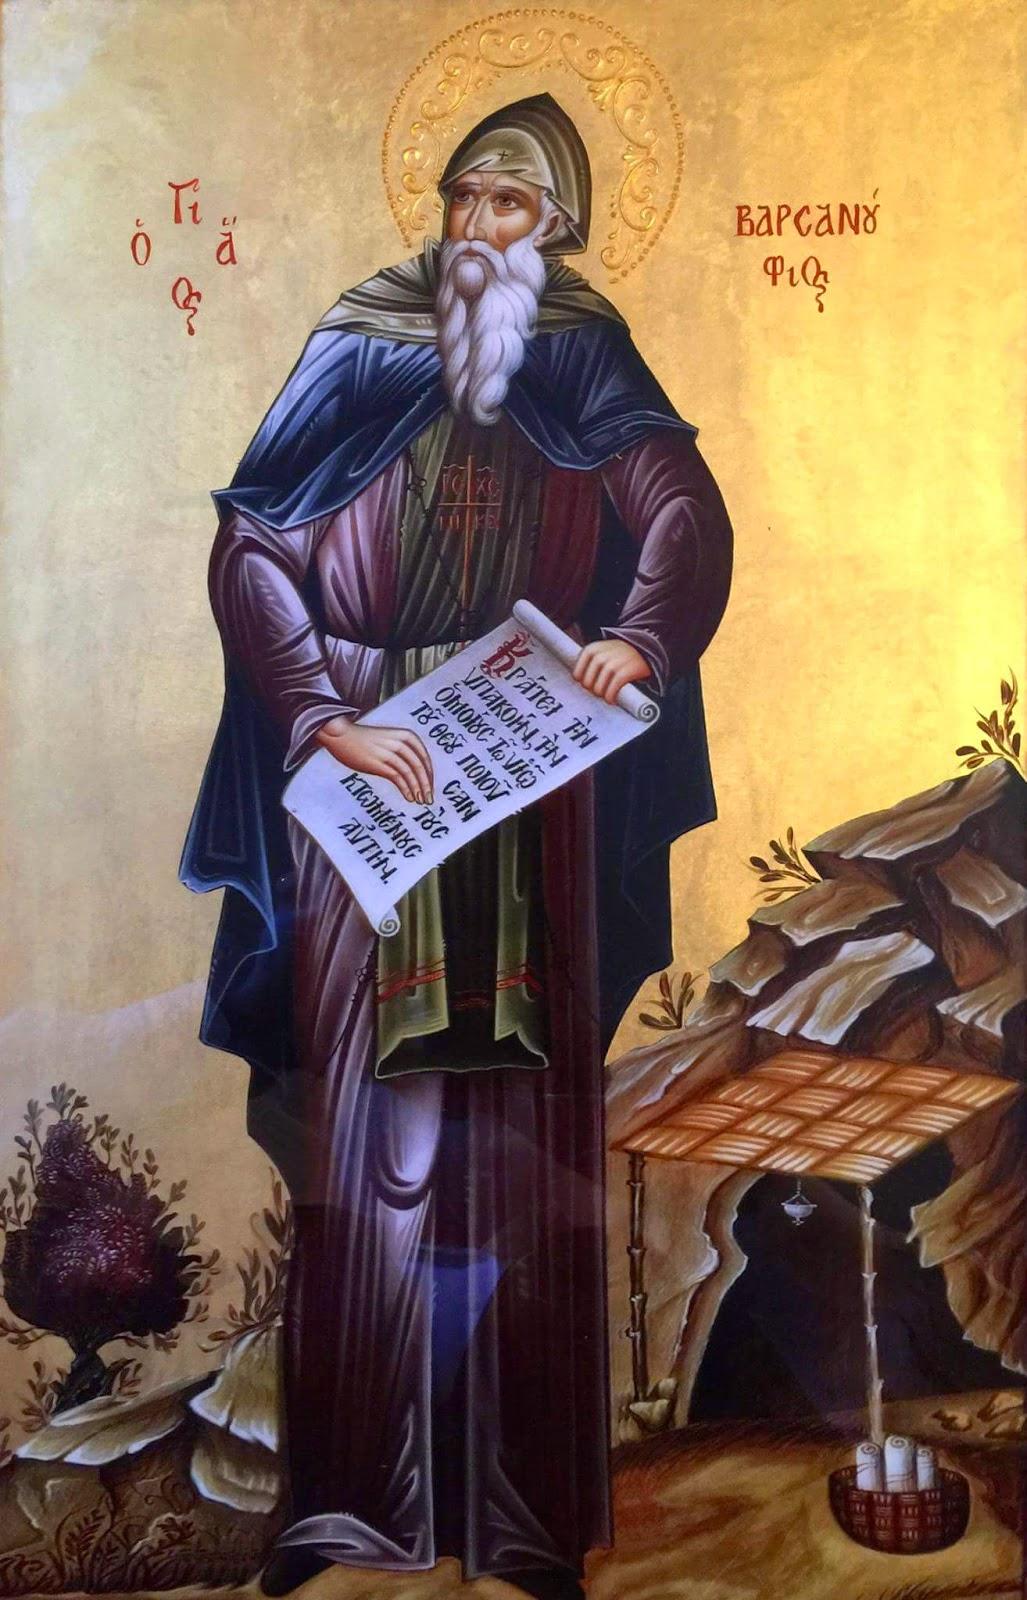 Elders and ancestral sin